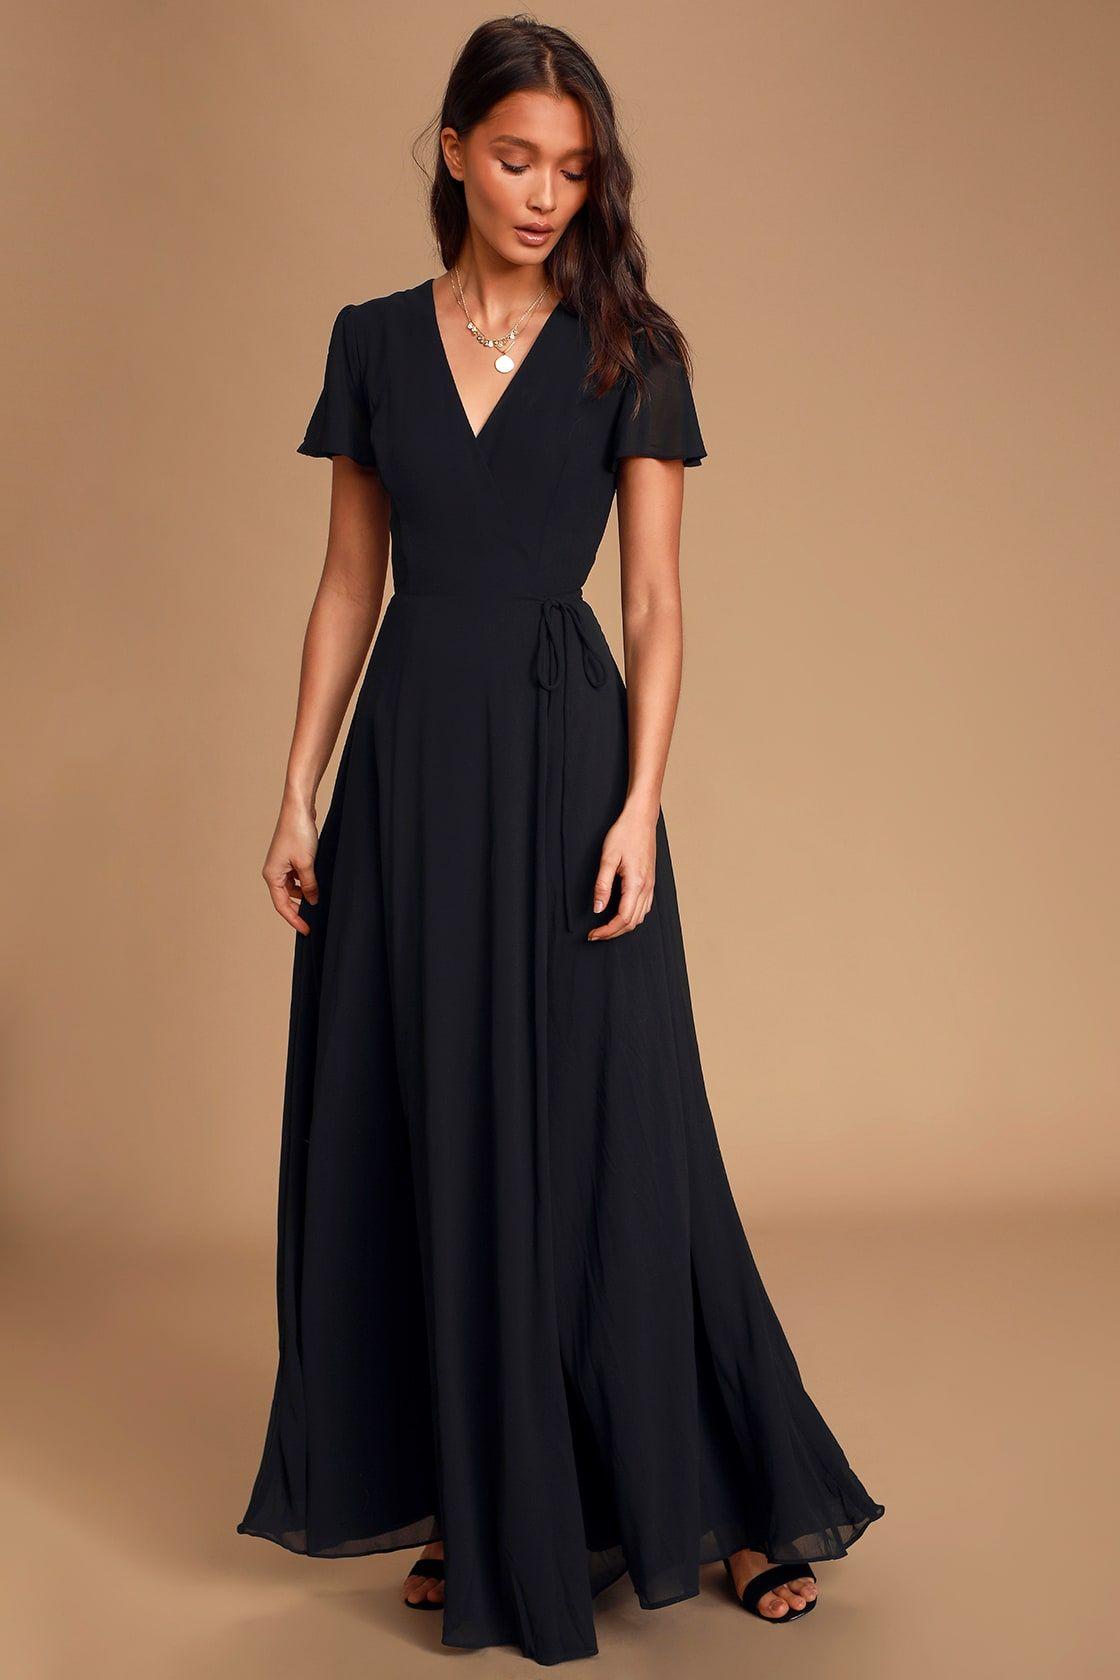 You Re My Everything Black Short Sleeve Wrap Maxi Dress Maxi Dress Black Maxi Dress Formal Maxi Wrap Dress [ 1680 x 1120 Pixel ]